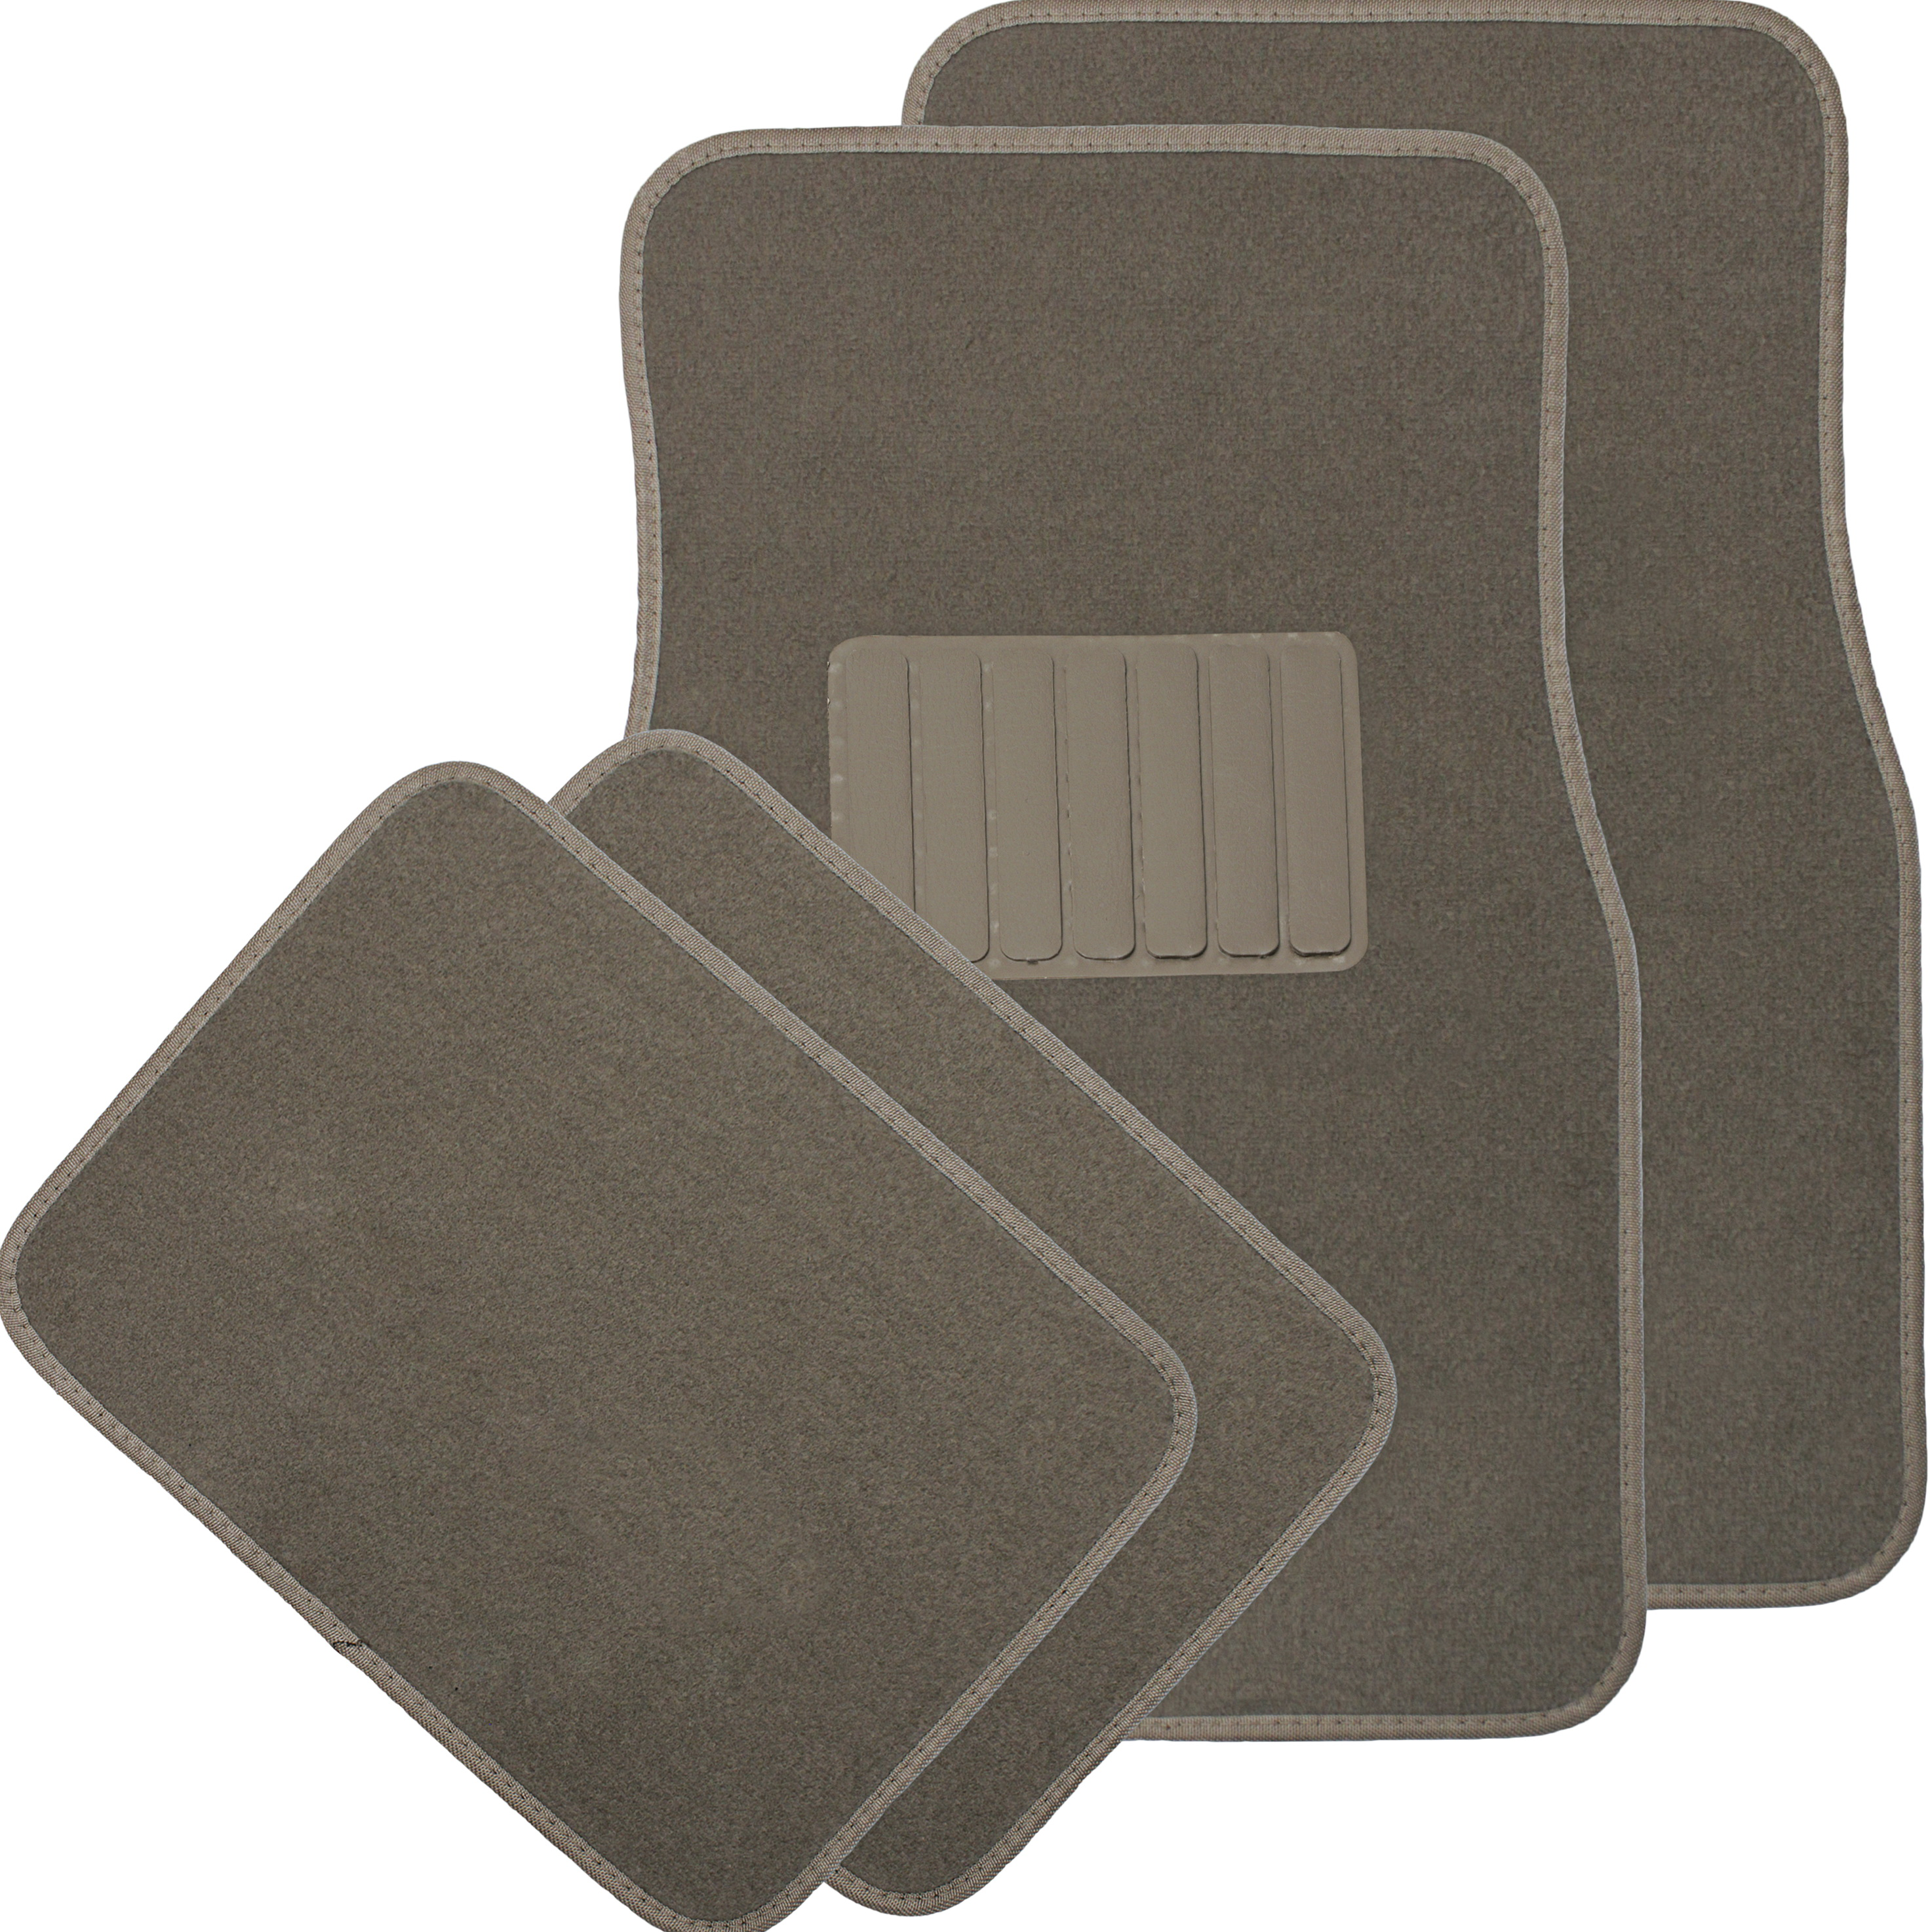 auto seat cushions autozone home design ideas. Black Bedroom Furniture Sets. Home Design Ideas